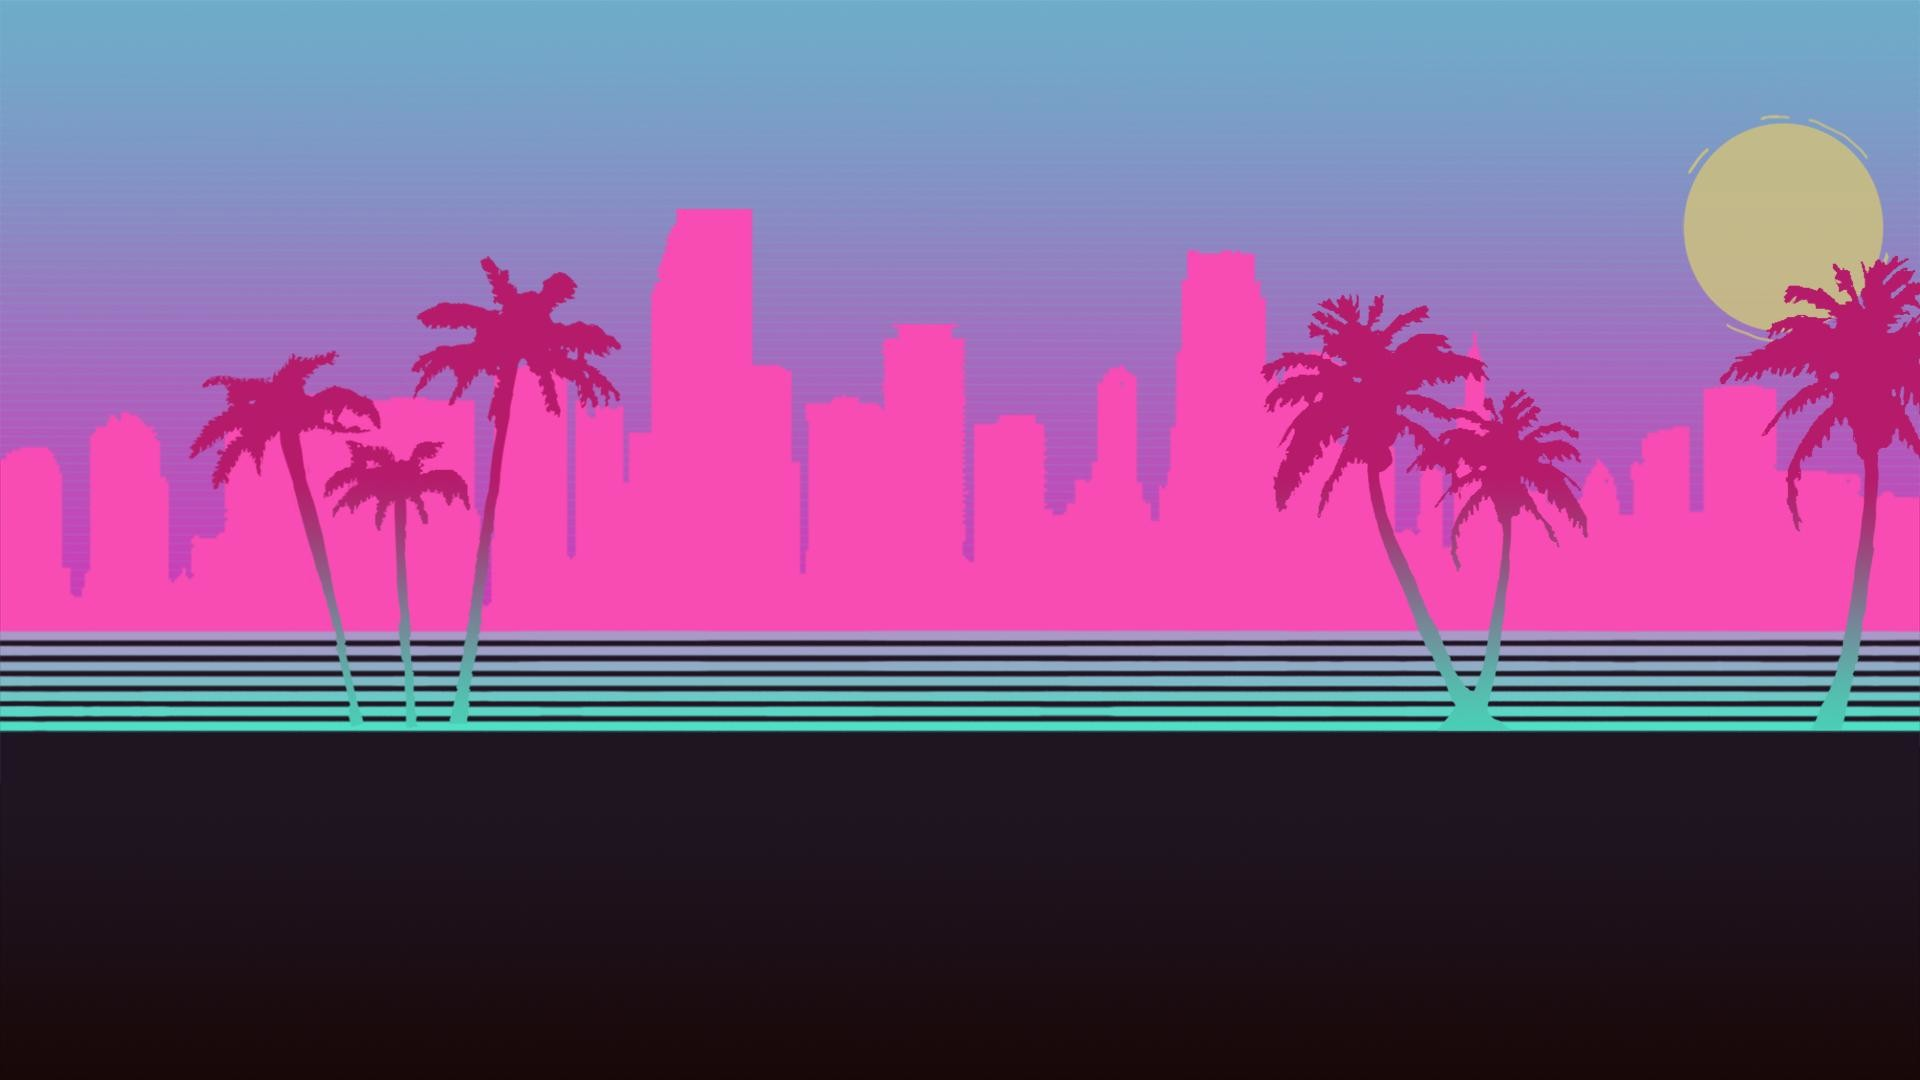 Hotline Miami desktop background (1920×1080) Need #iPhone #6S #Plus # Wallpaper